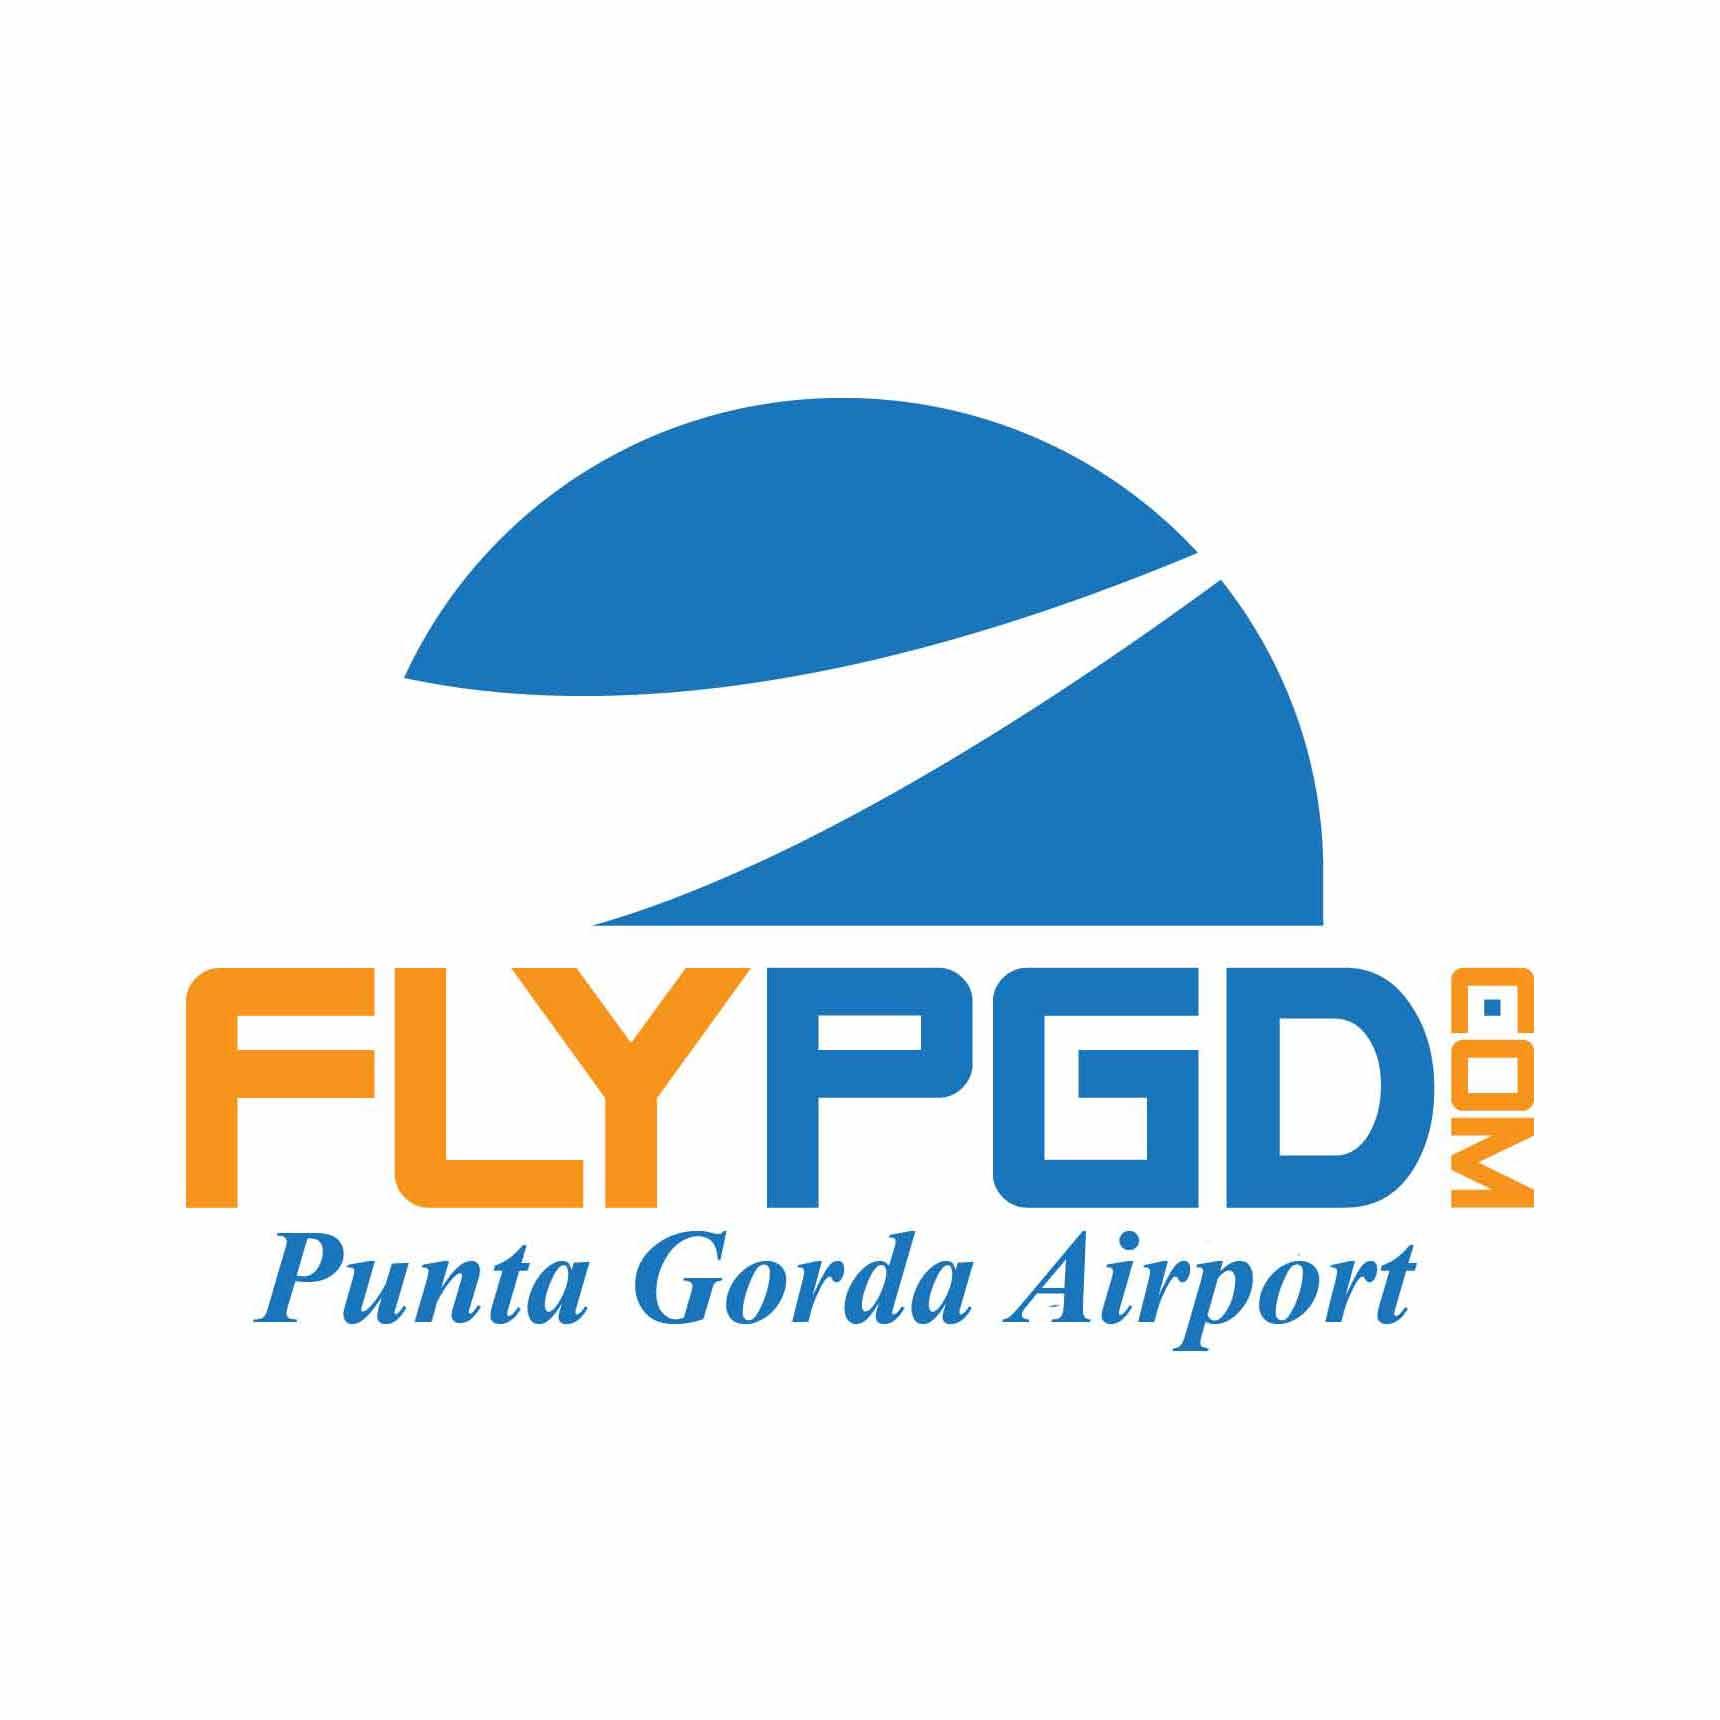 Punta Gorda Airport